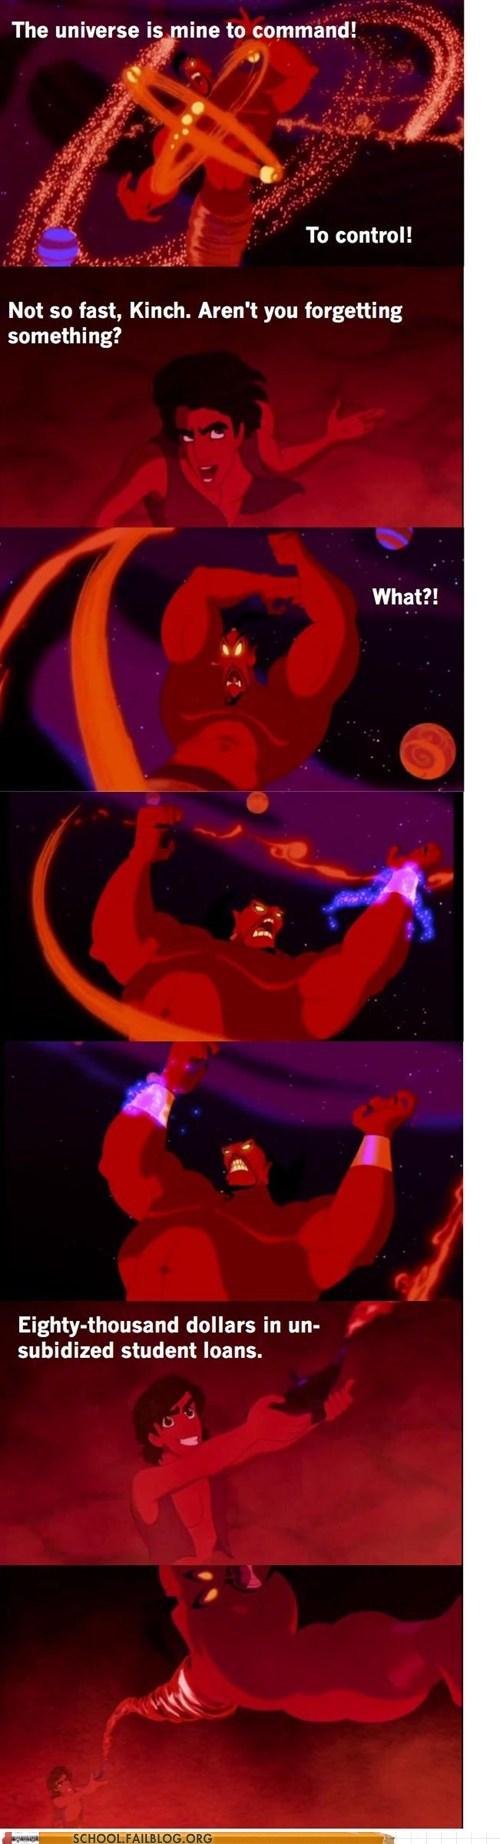 aladdin,genie,jafar,mistake,student debt,universe